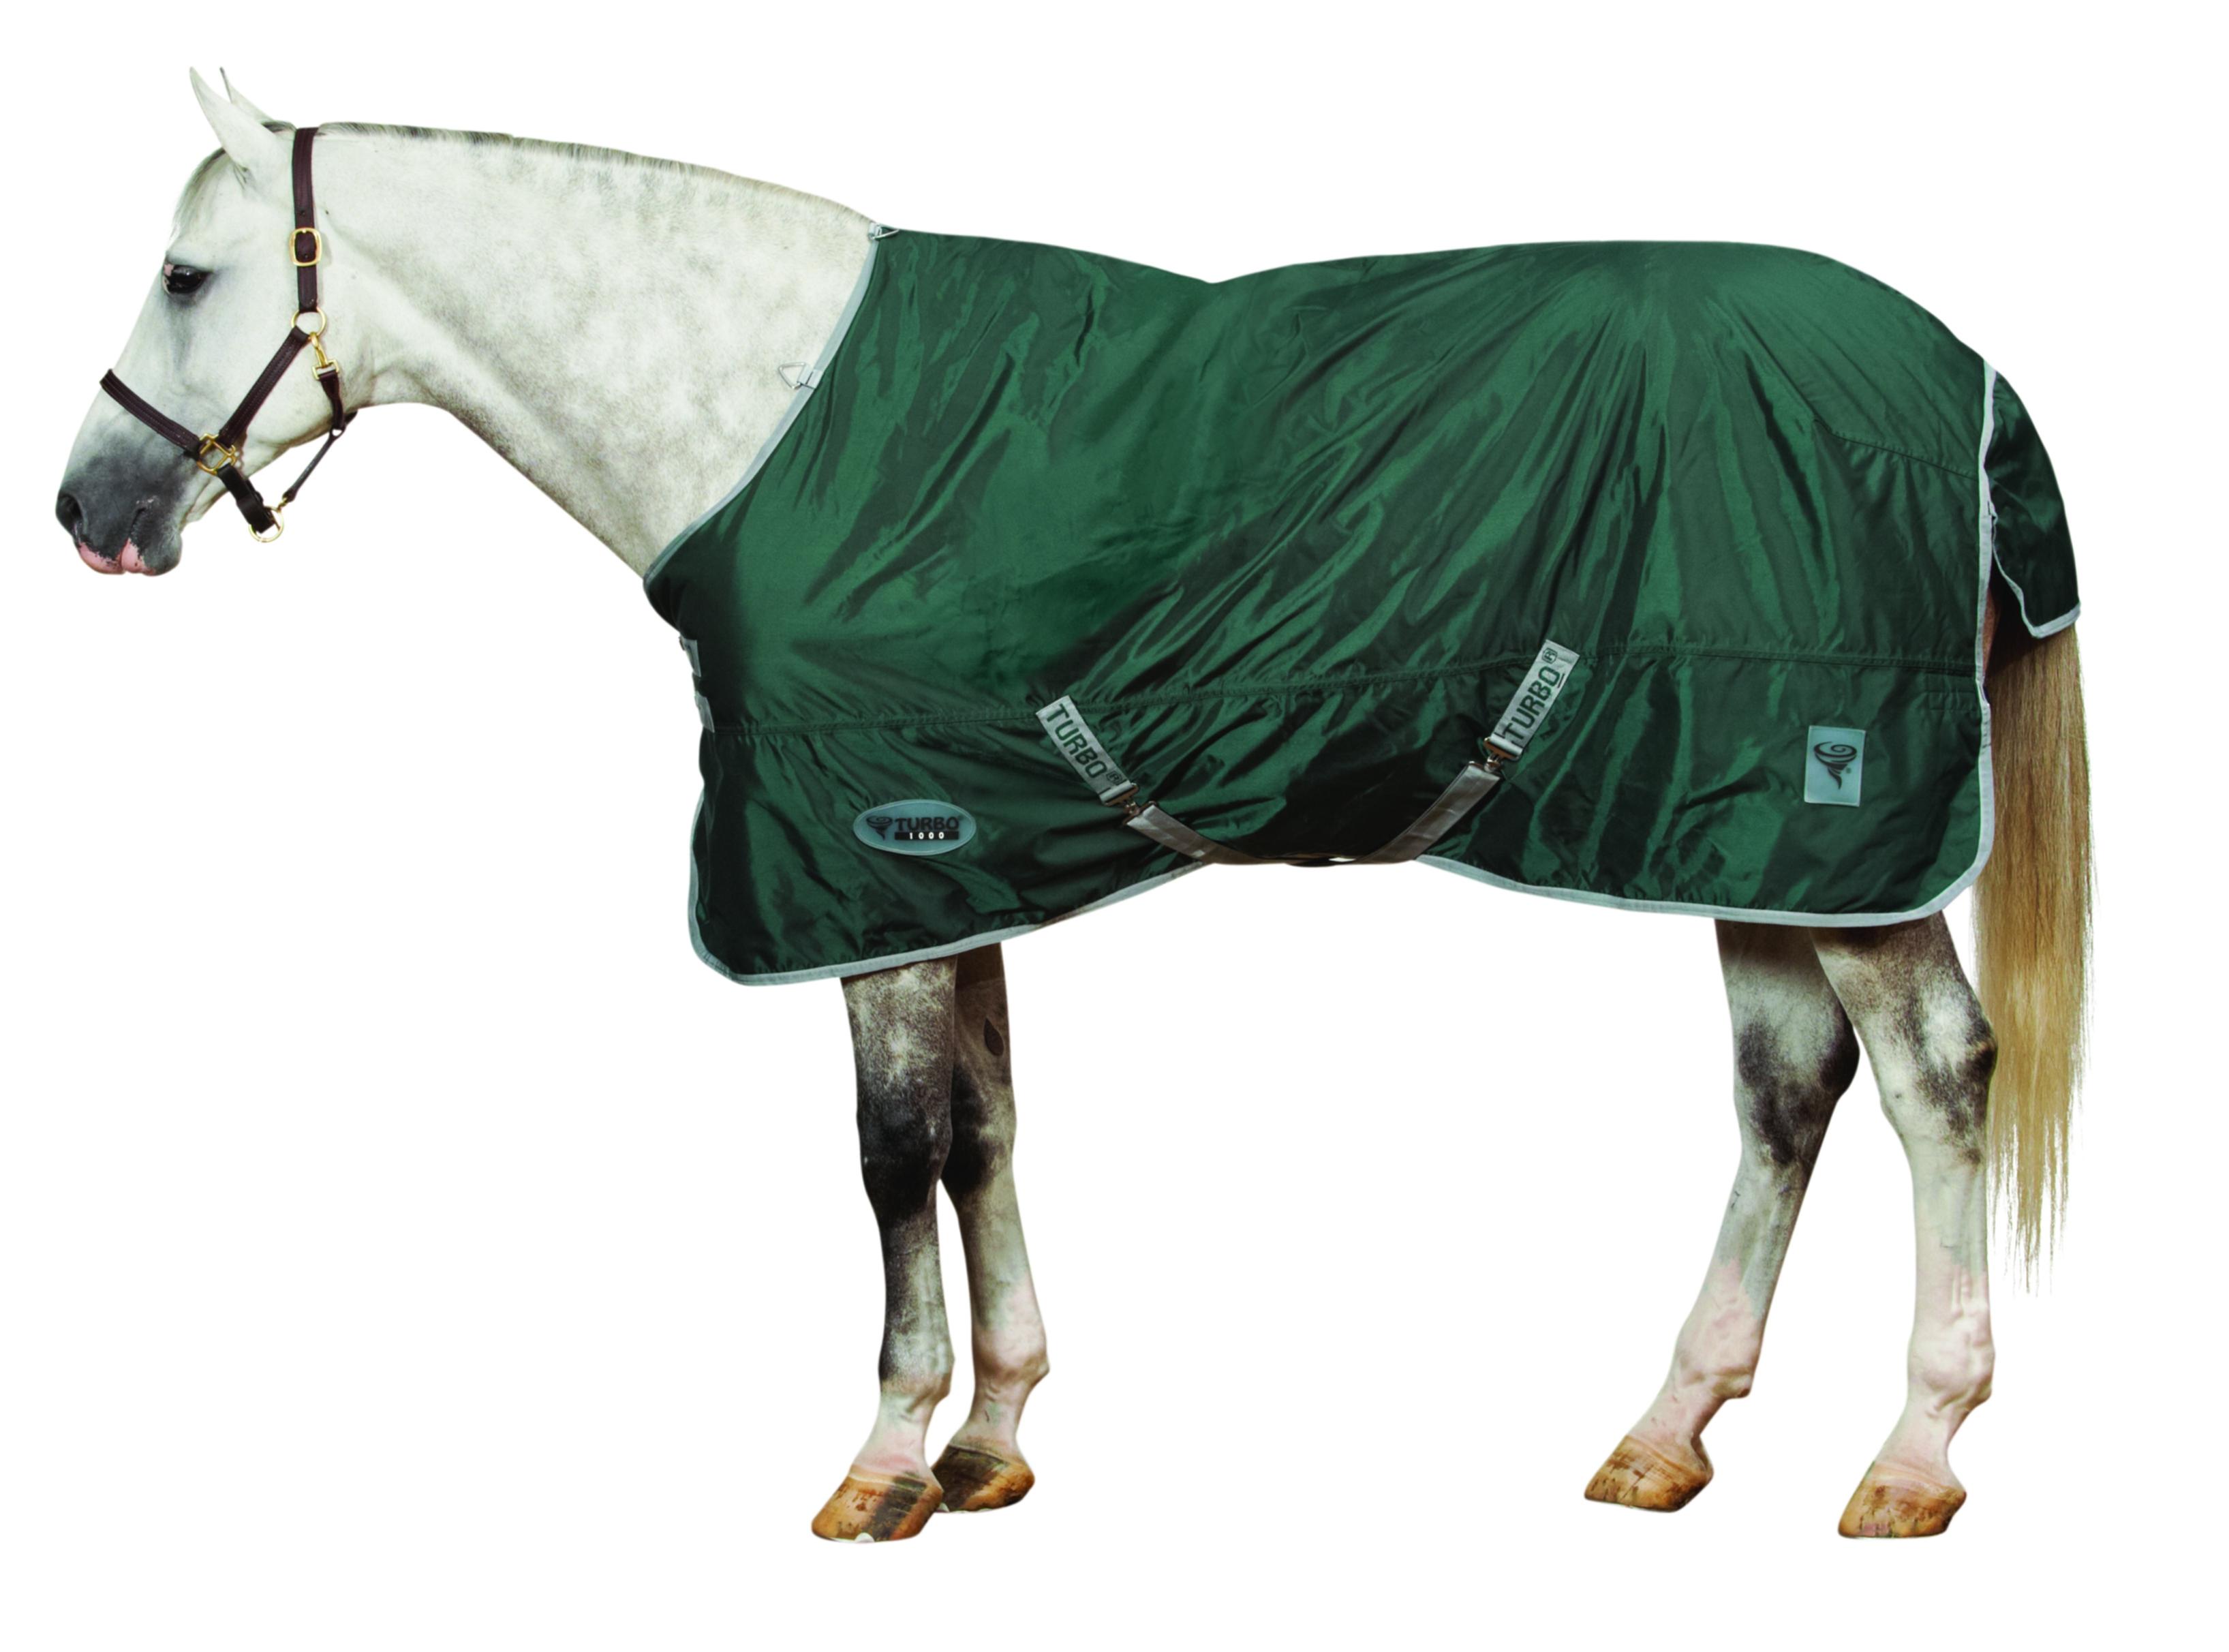 Centaur Turbo 1000D Waterproof / Breathable Mediumweight Turnout Blanket